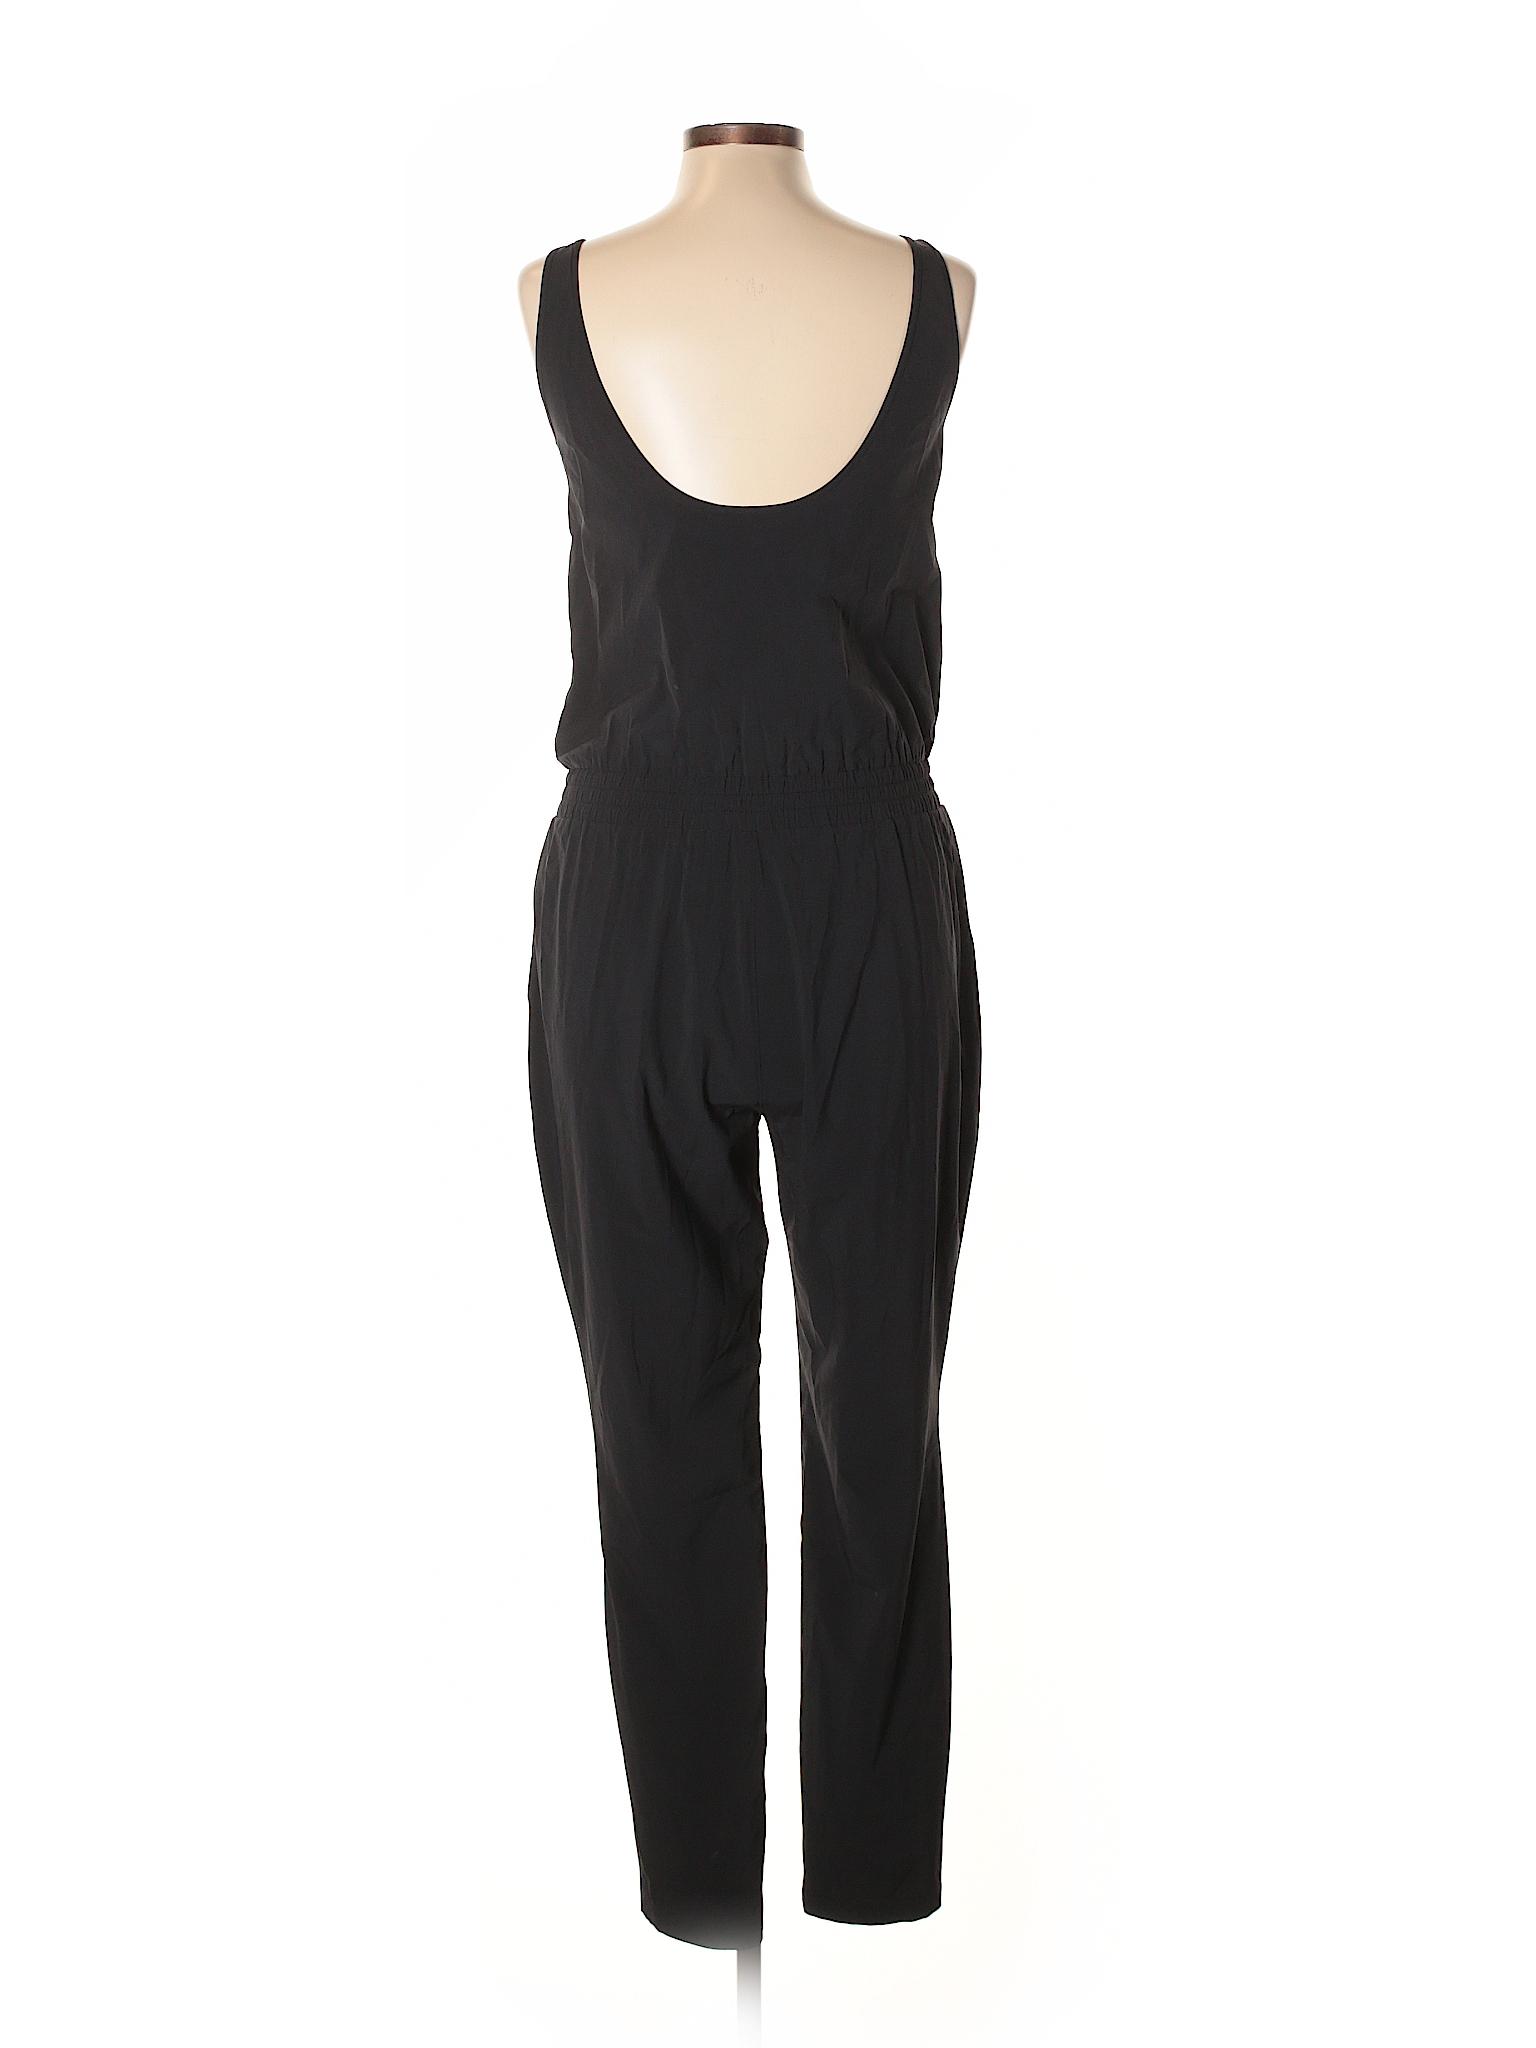 043e8cfe139 Athleta Solid Black Jumpsuit Size 6 - 66% off